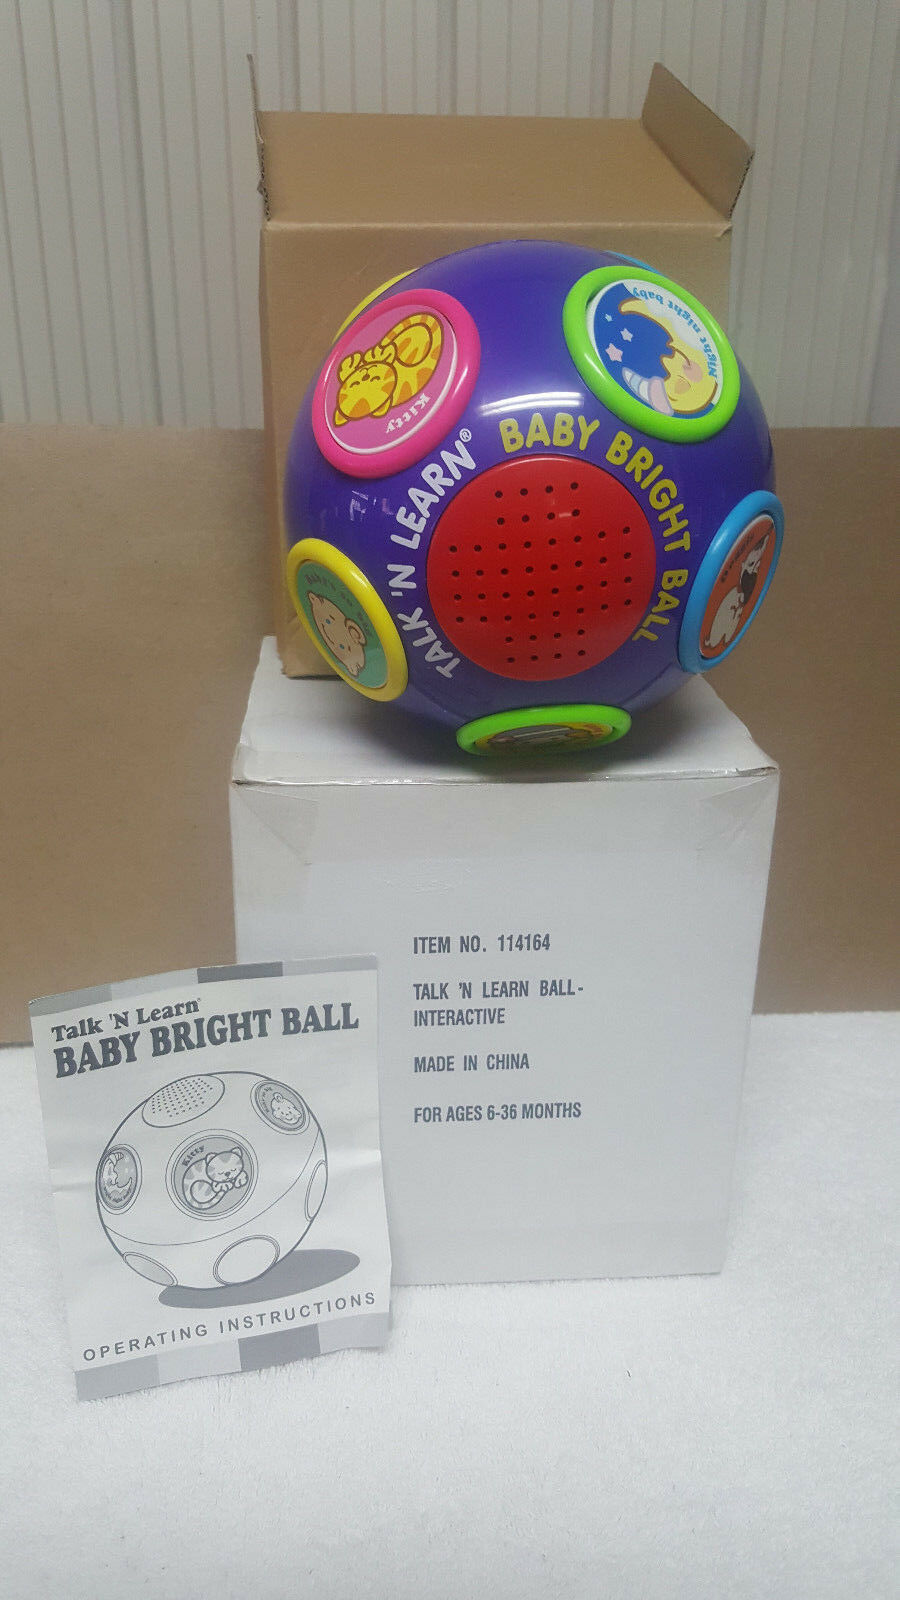 SCIENTIFIC TOYS, INC. TALK 'N 'N 'N LEARN BABY BRIGHT BALL - AGES 6-36 MONTHS   NEW    d3b56e